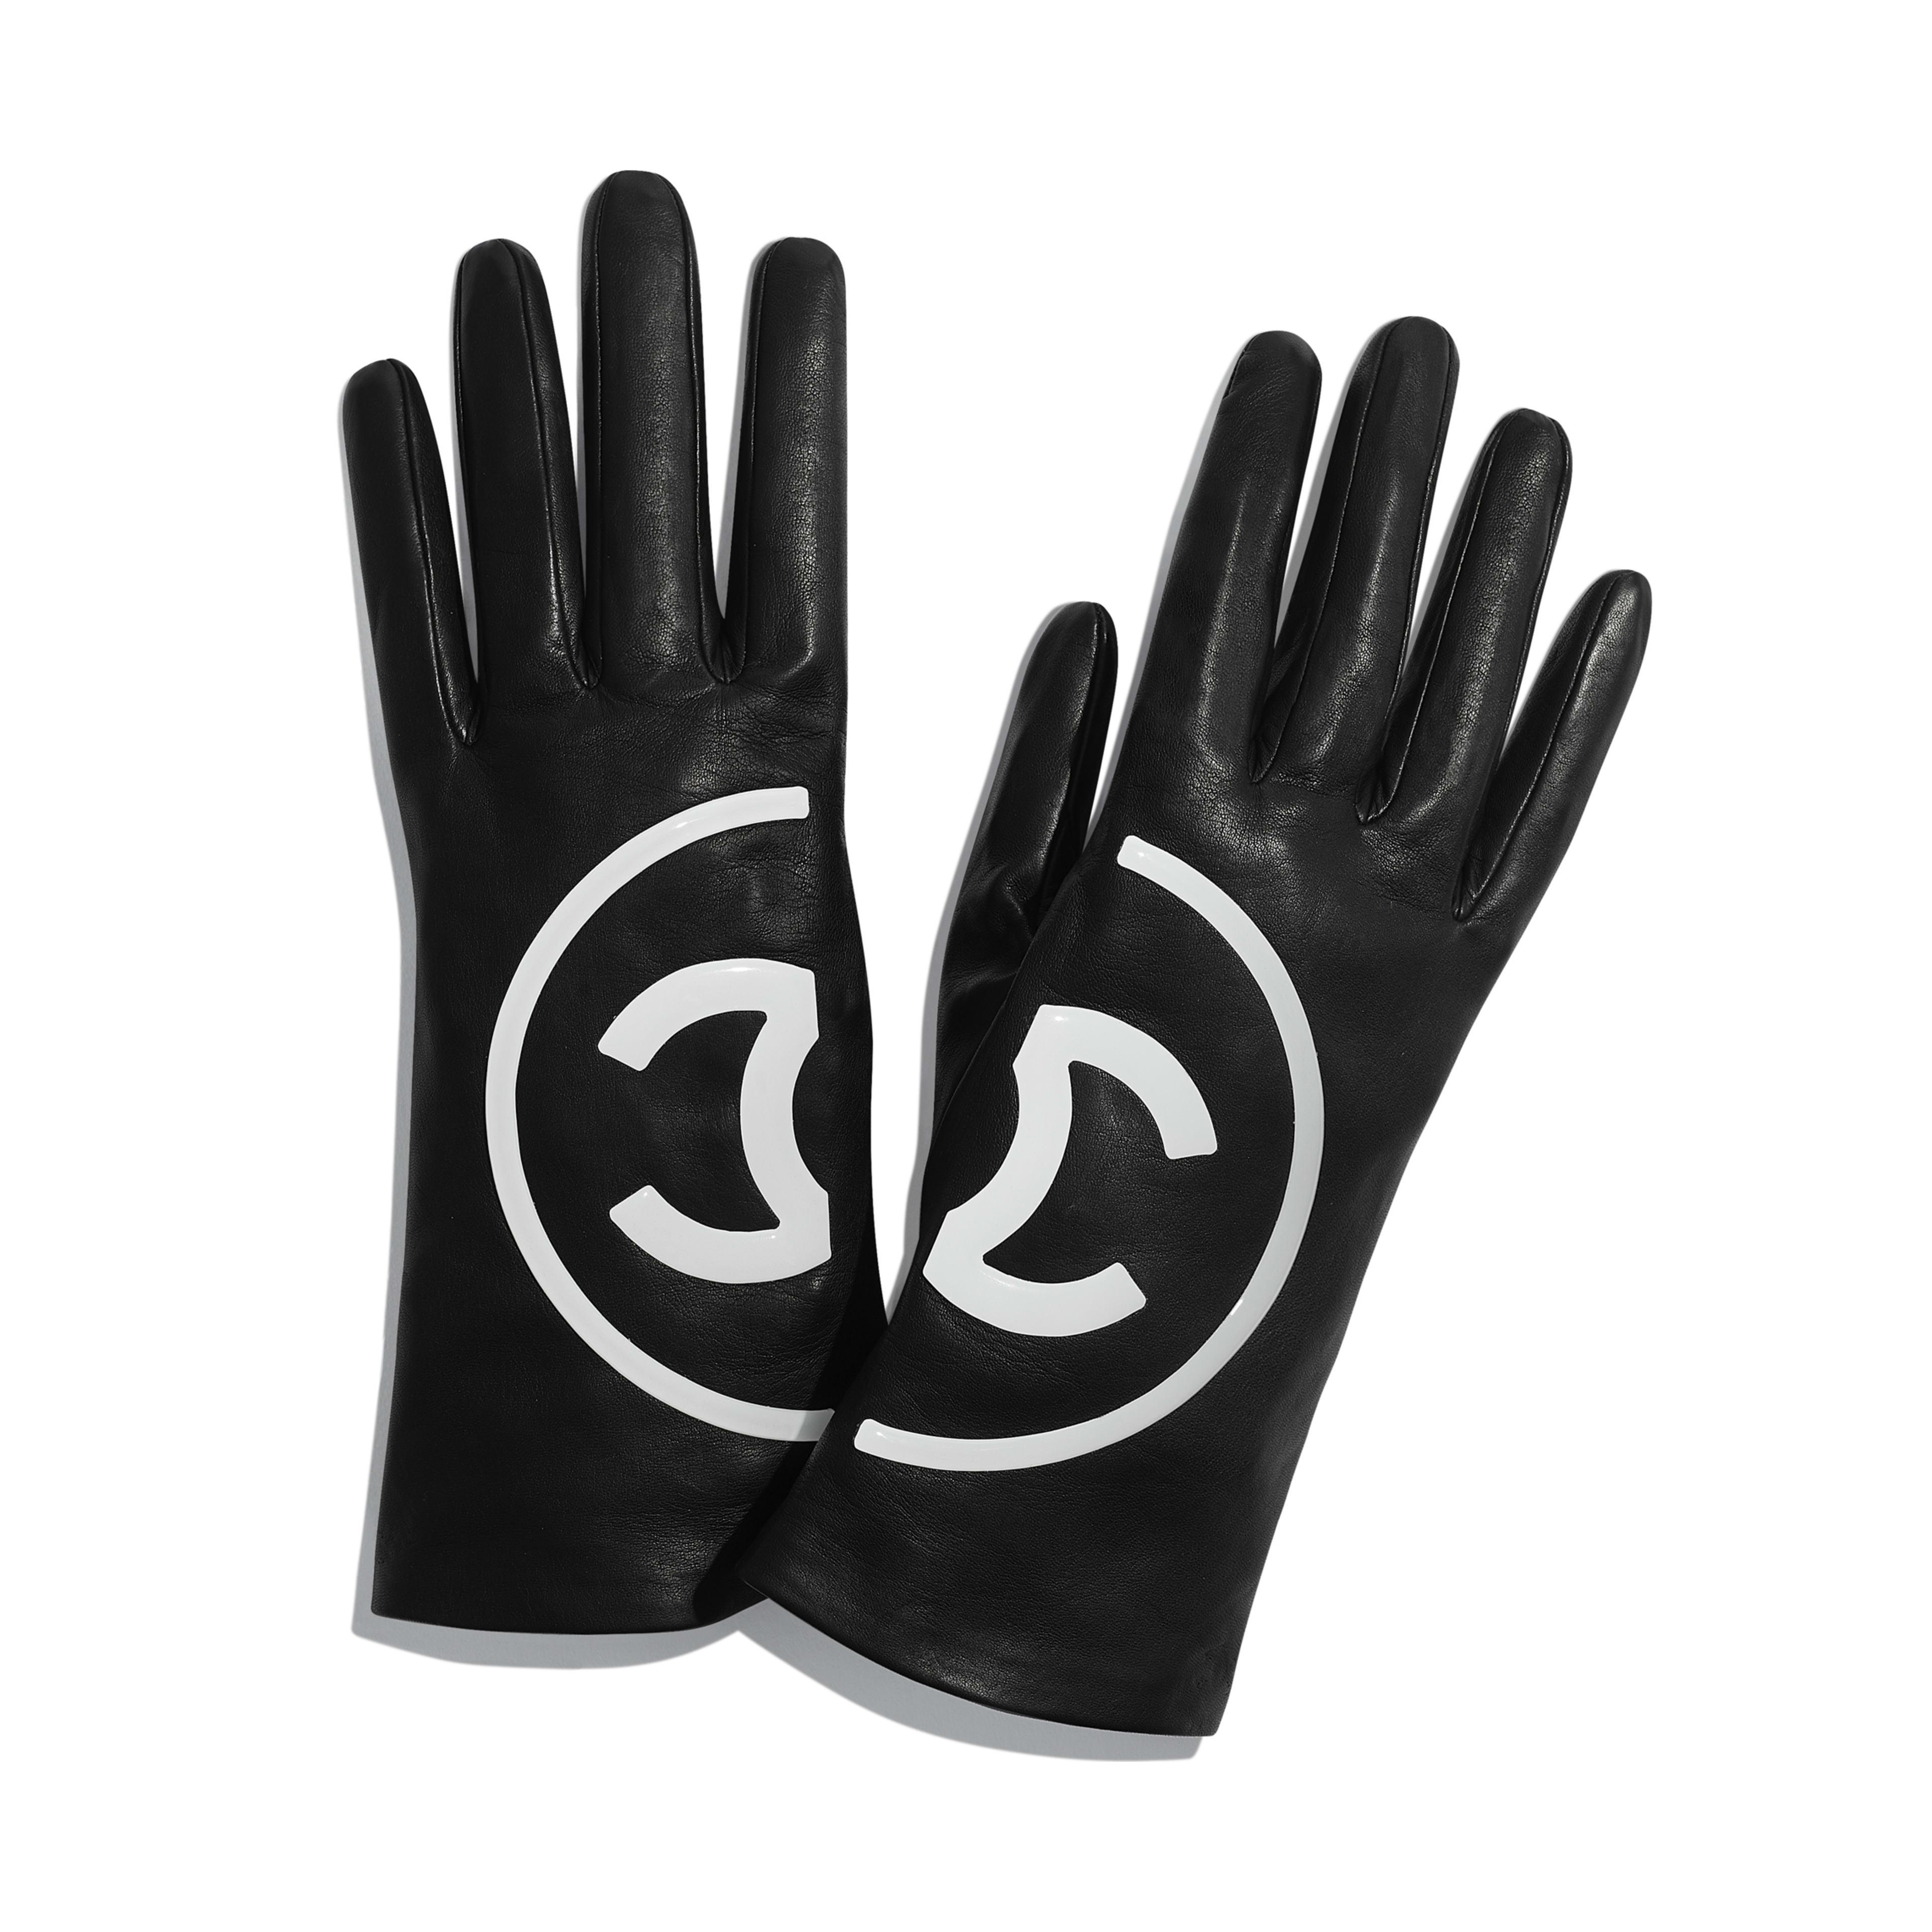 Gloves - Black & White - Lambskin - Default view - see full sized version